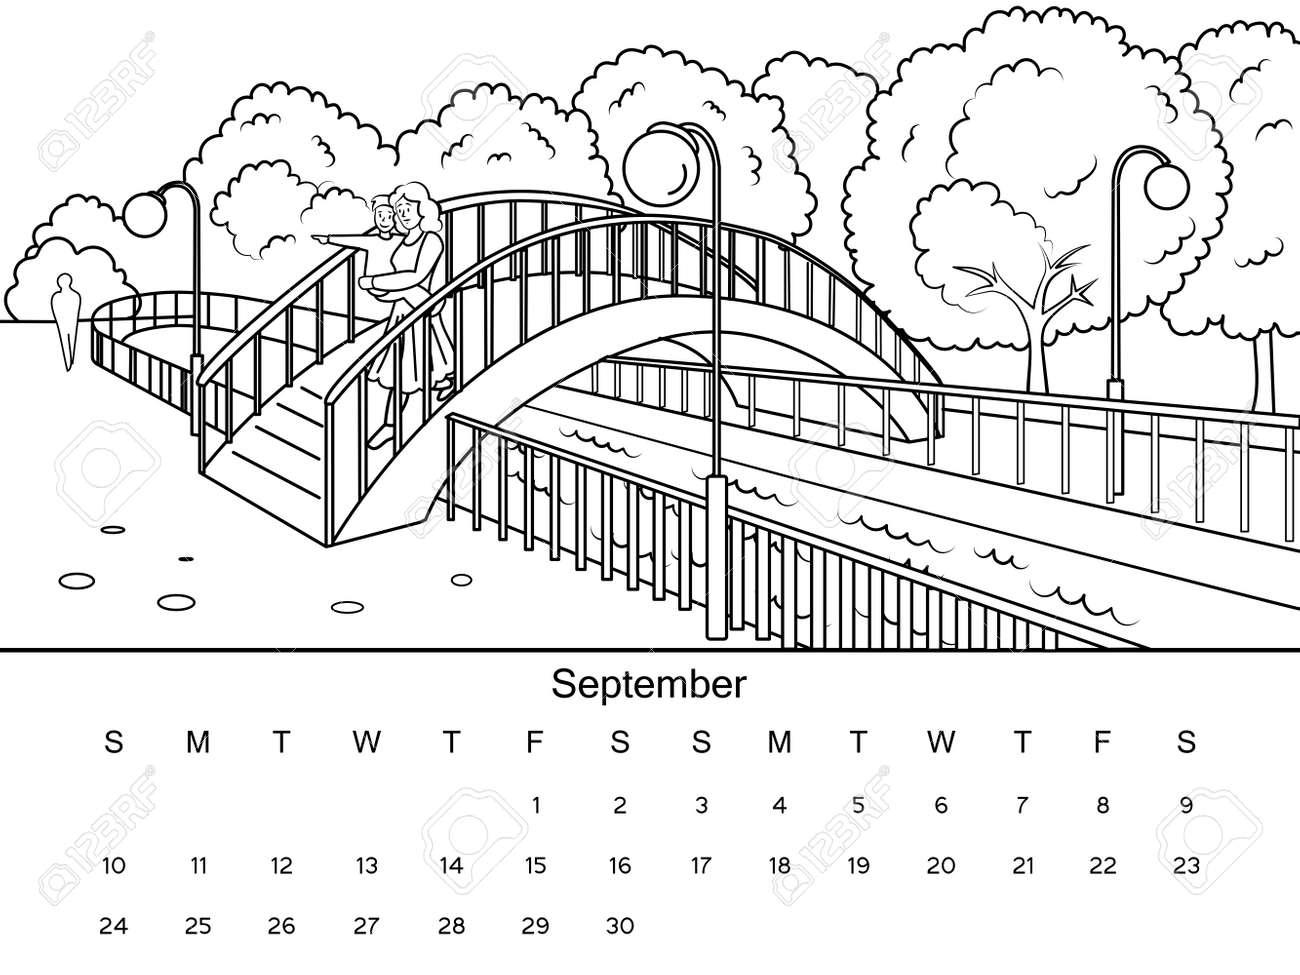 Calendario De Septiembre Con Imagen De Libro Para Colorear. Dibujo ...